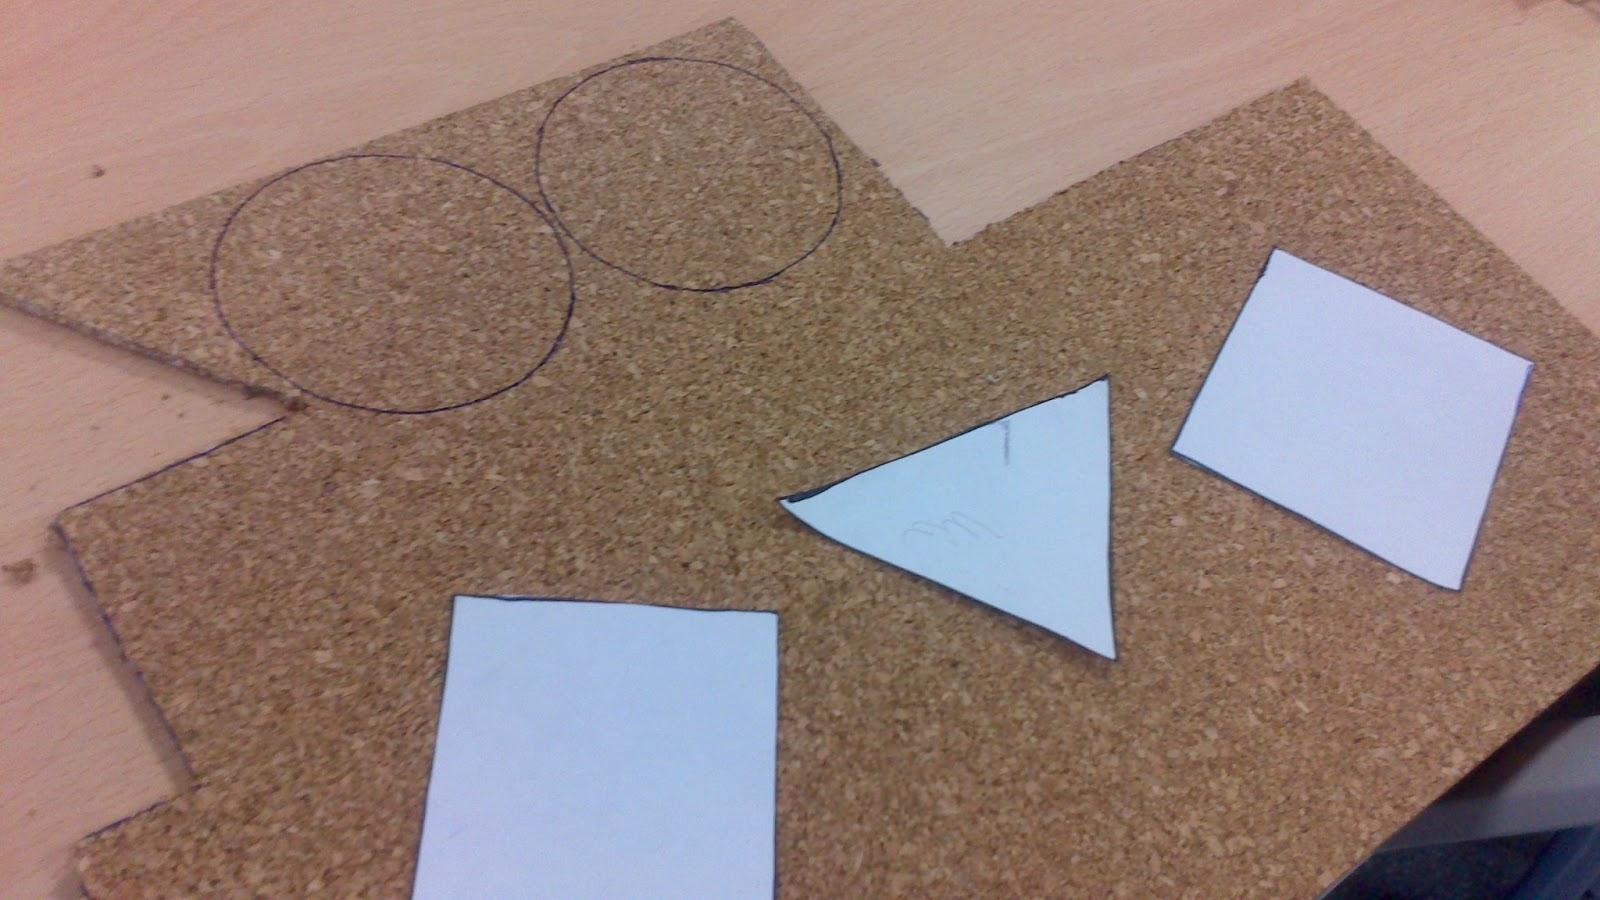 Las mafaldas art sticas qu podemos hacer con un baco for Como pegar papel mural en madera